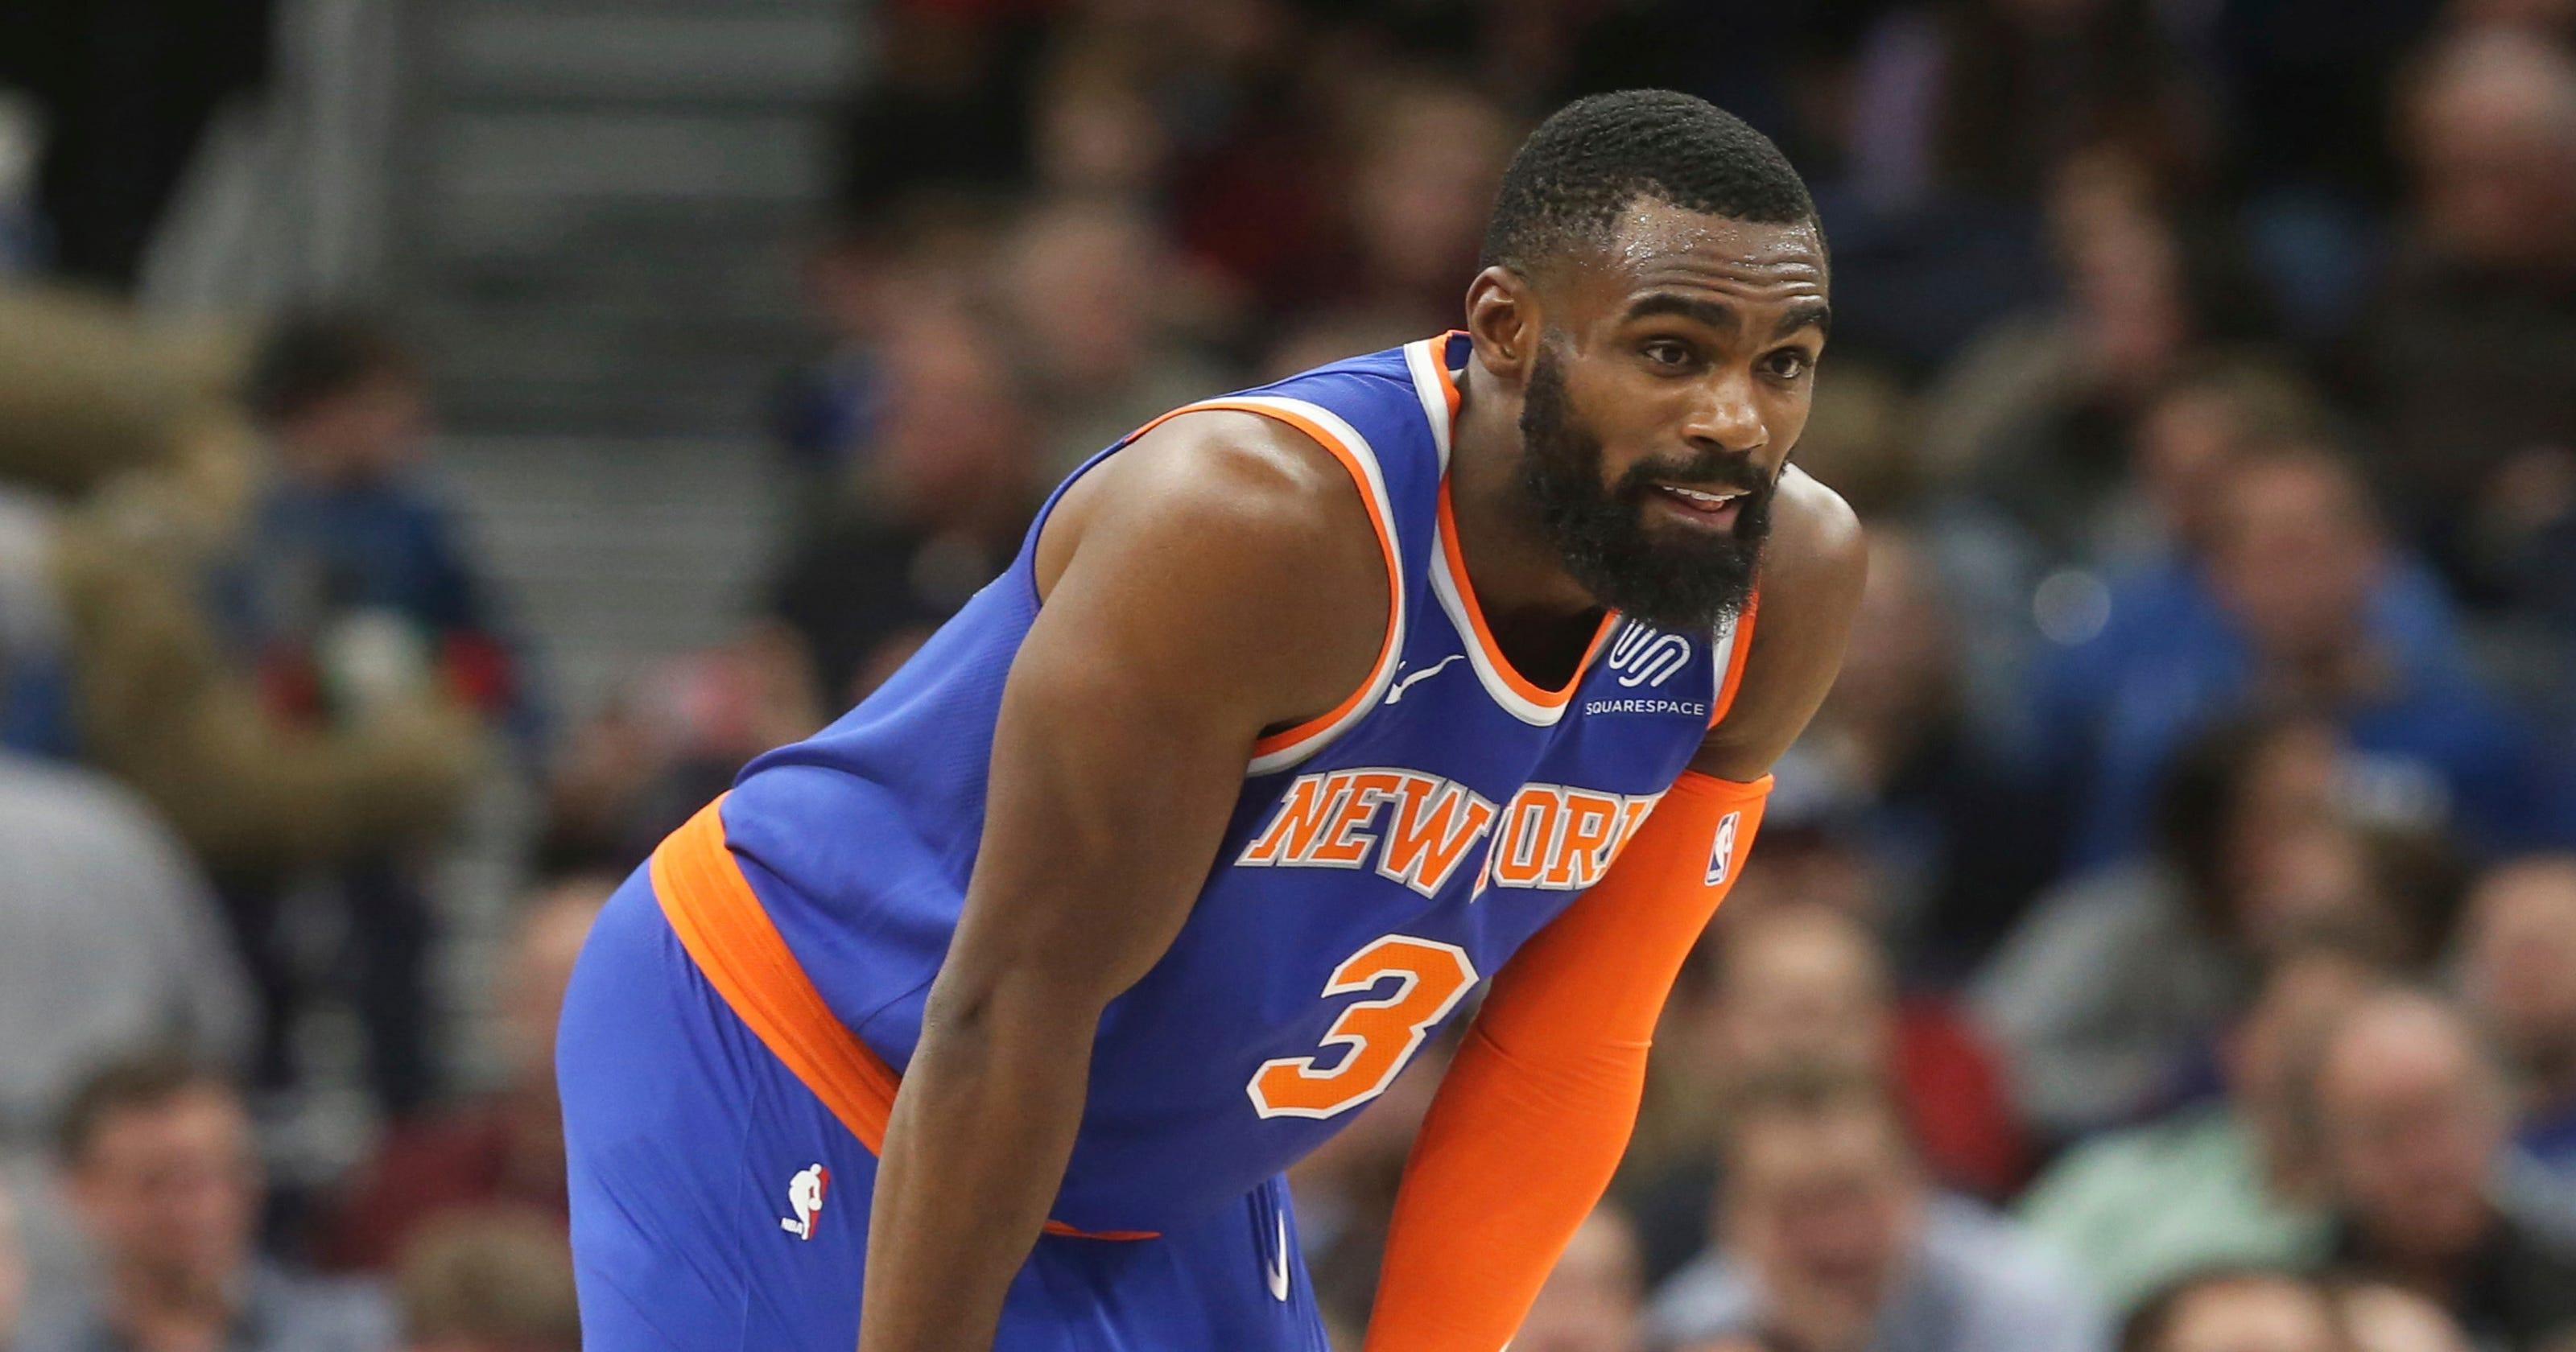 brand new 8829a 60082 New York Knicks: Tim Hardaway Jr. returns to action